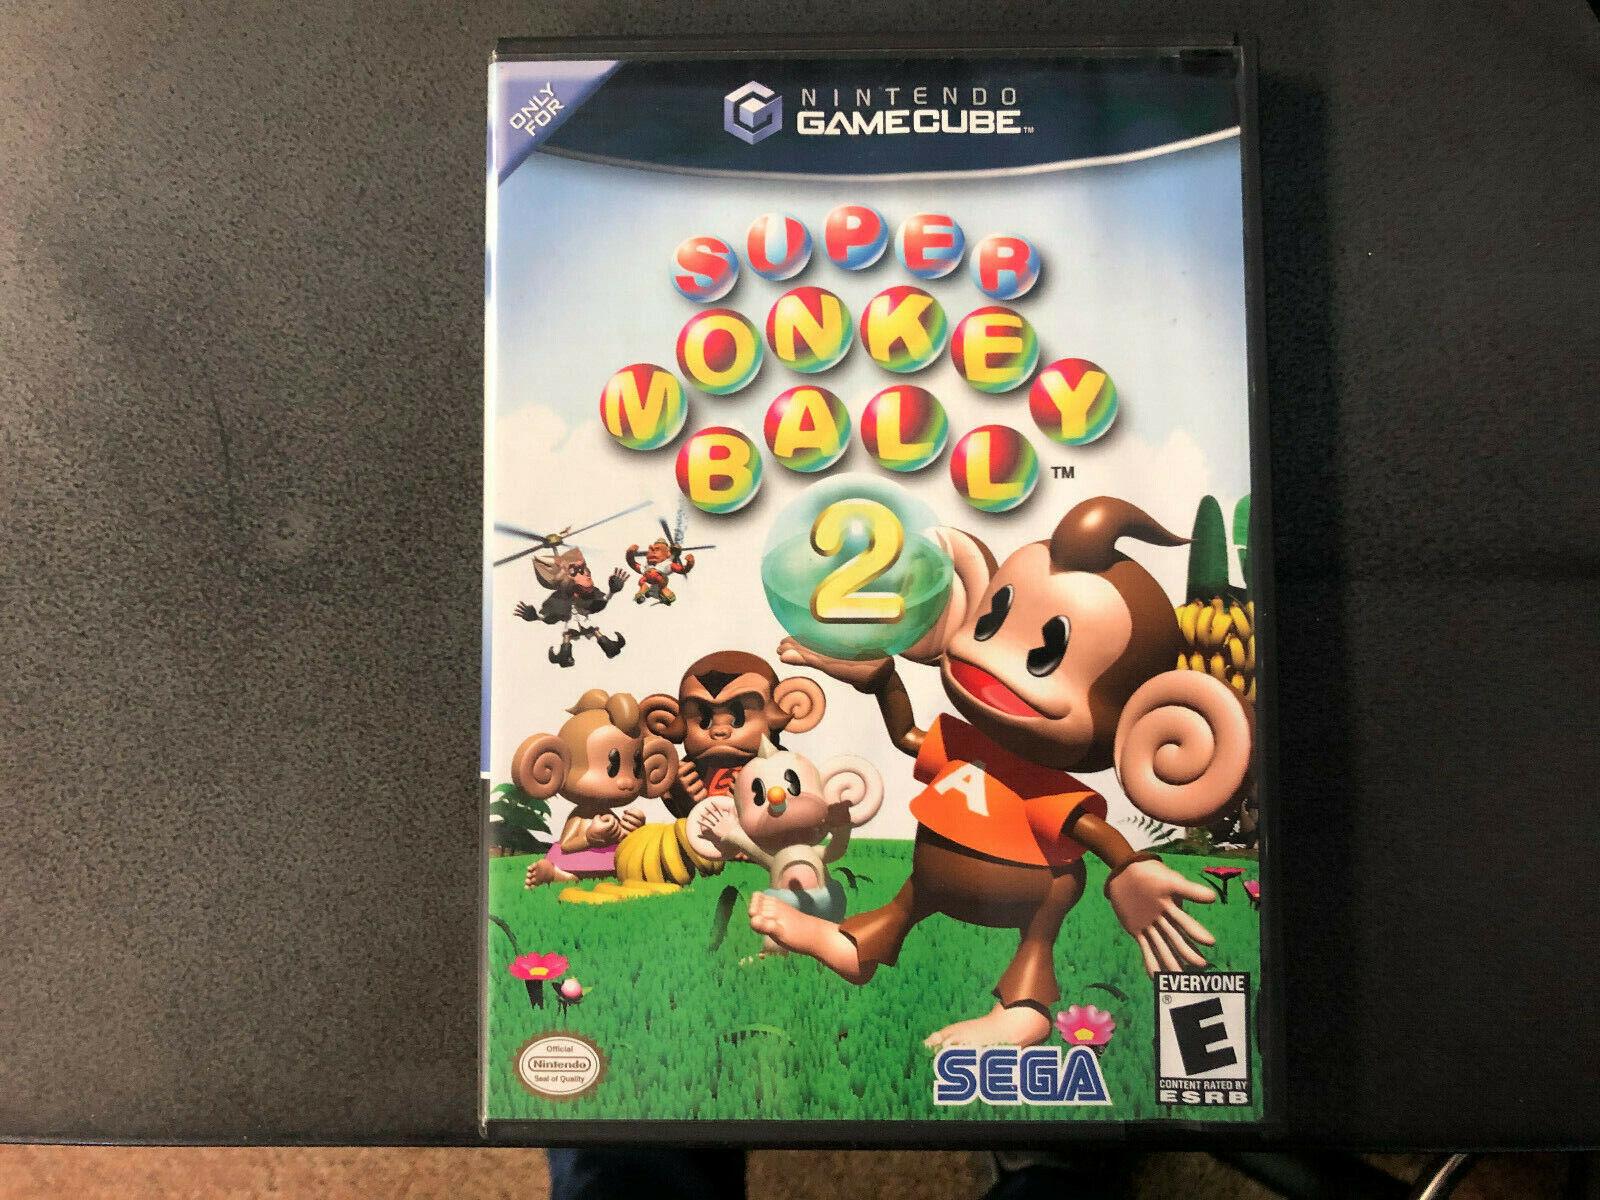 Super Monkey Ball 2 Nintendo GameCube, 2002 Black Label CIB RARE Tested  - $31.00